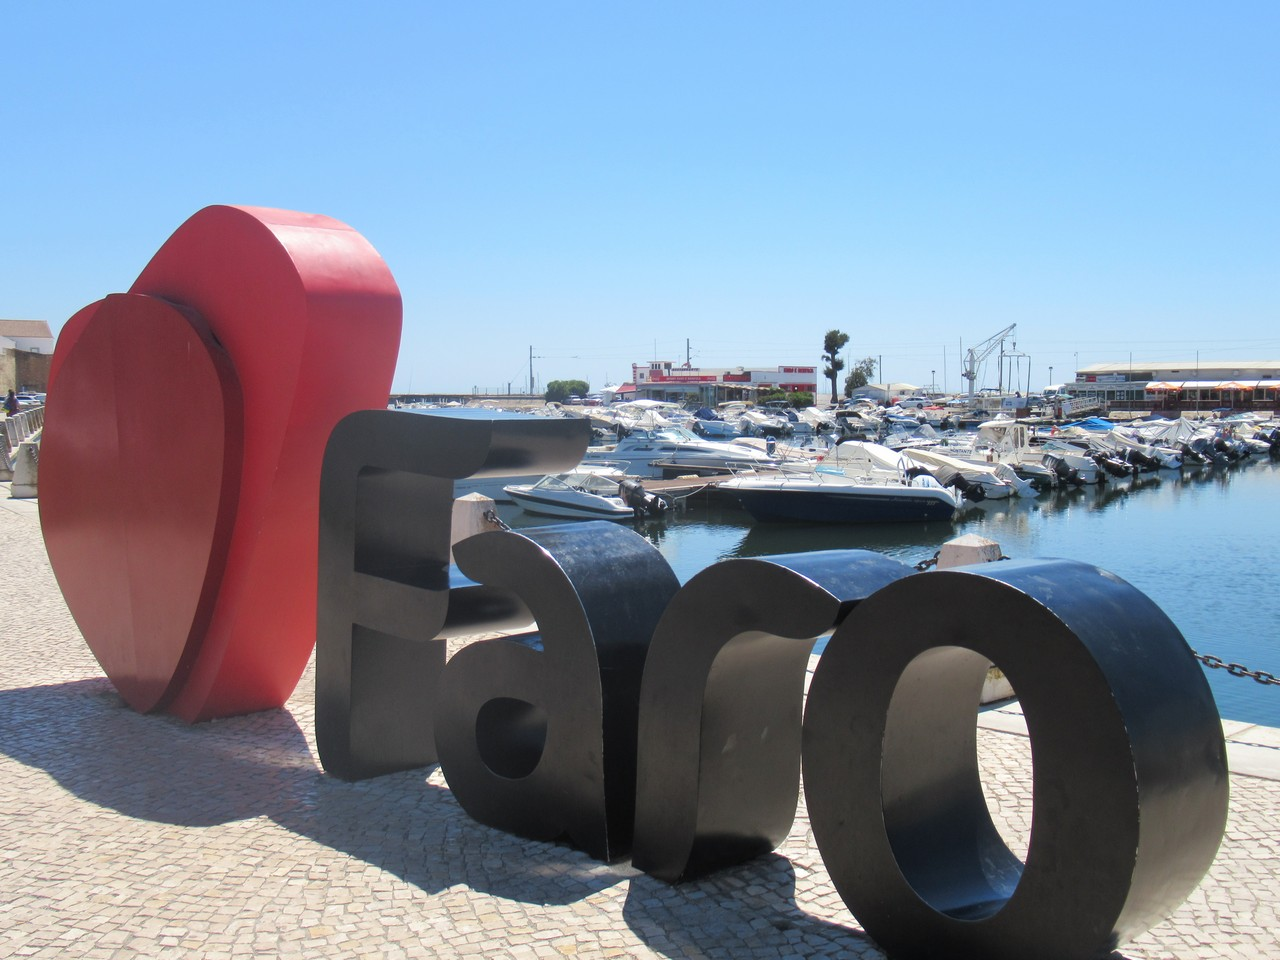 We did indeed 'heart' Faro.